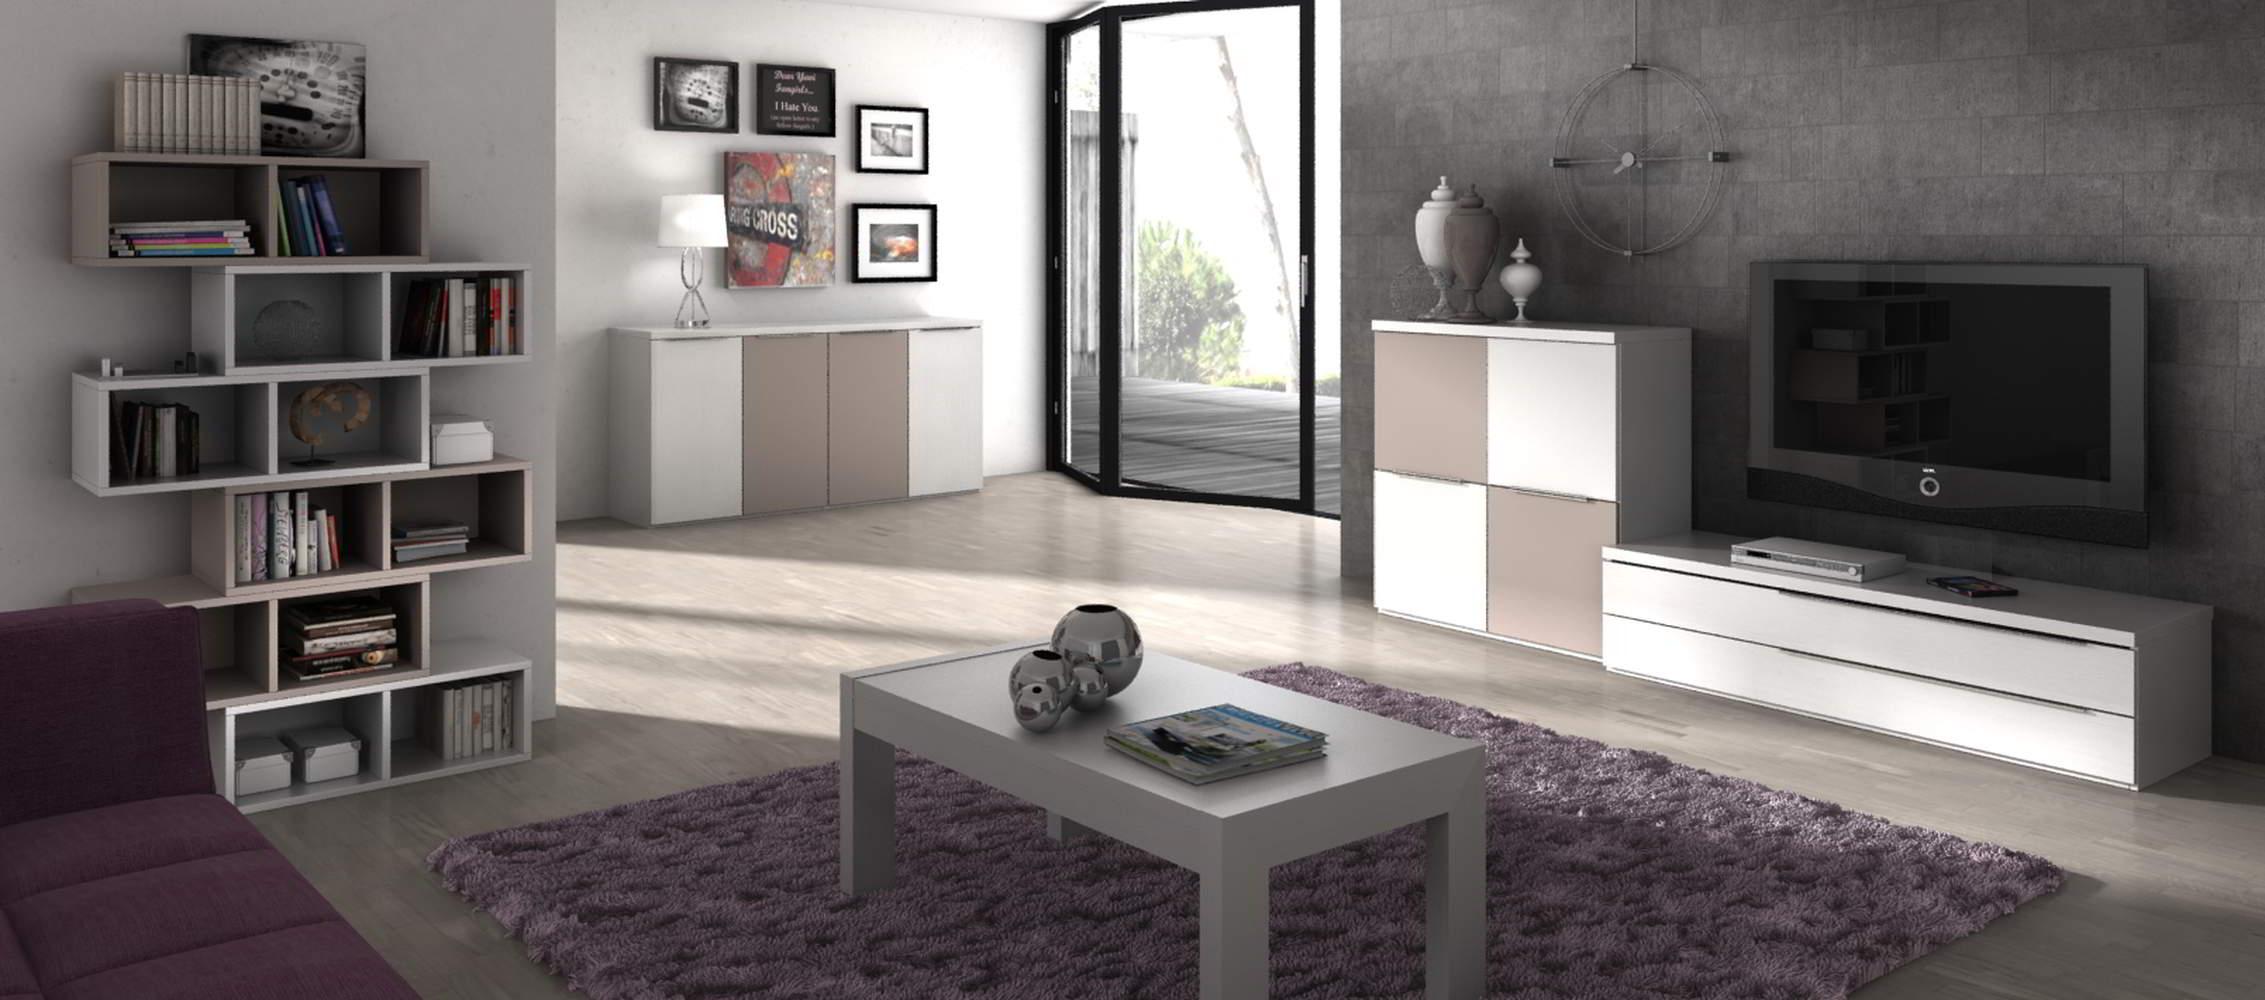 Muebles Paco Caballero  Ofertas del Mueble